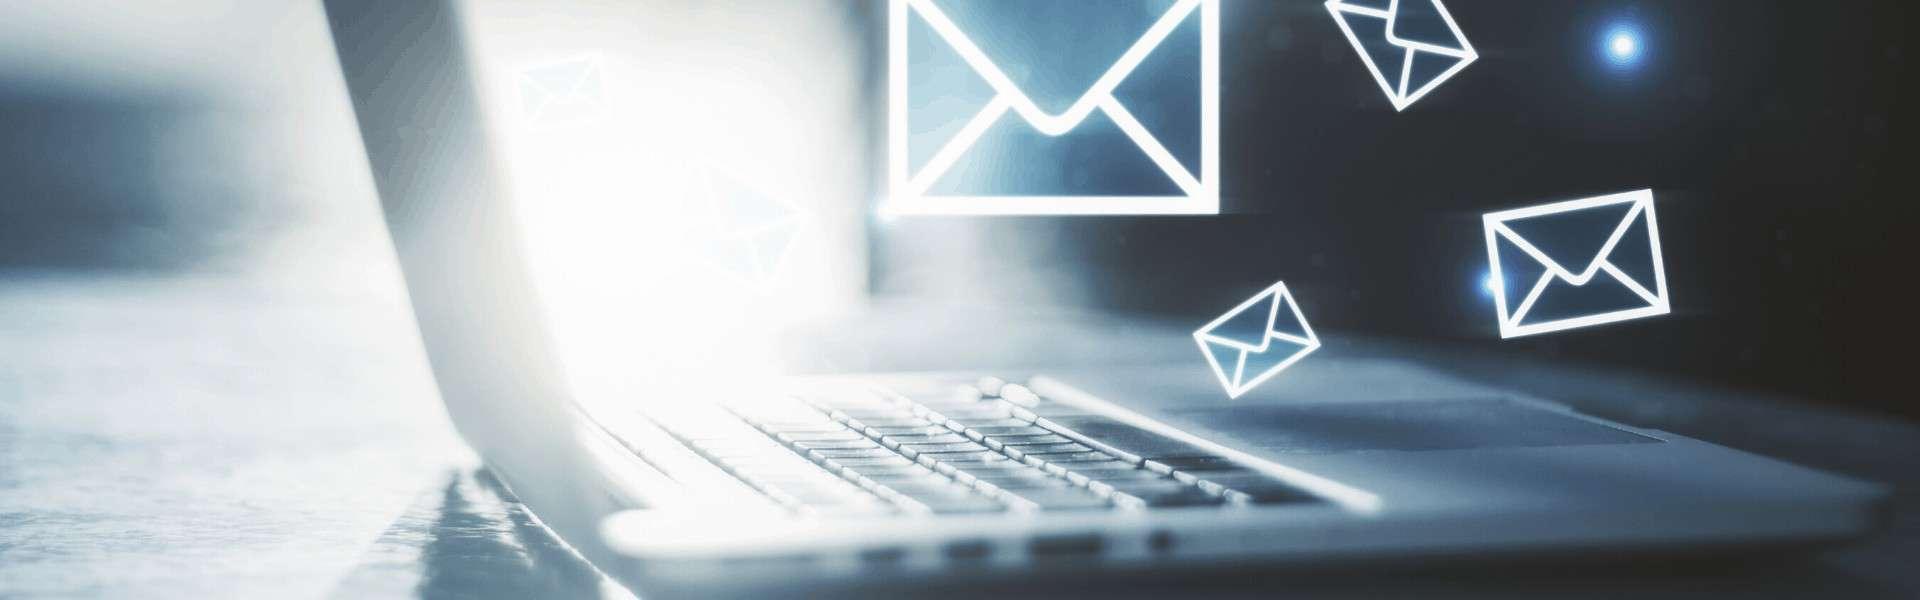 Newsletter DSGVO - E-Mails